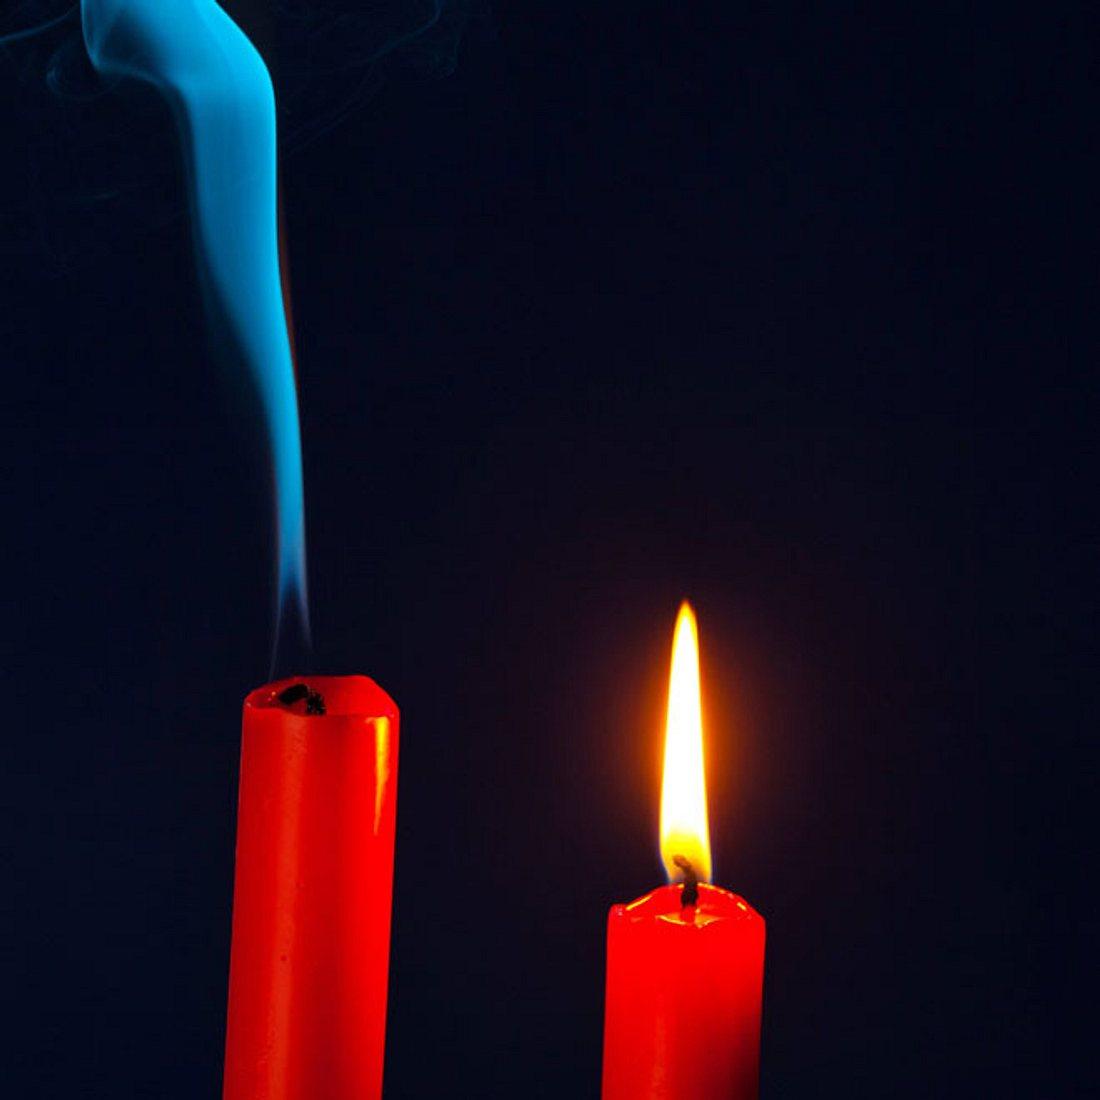 Castingshow-Star ermordet seine Ex-Freundin